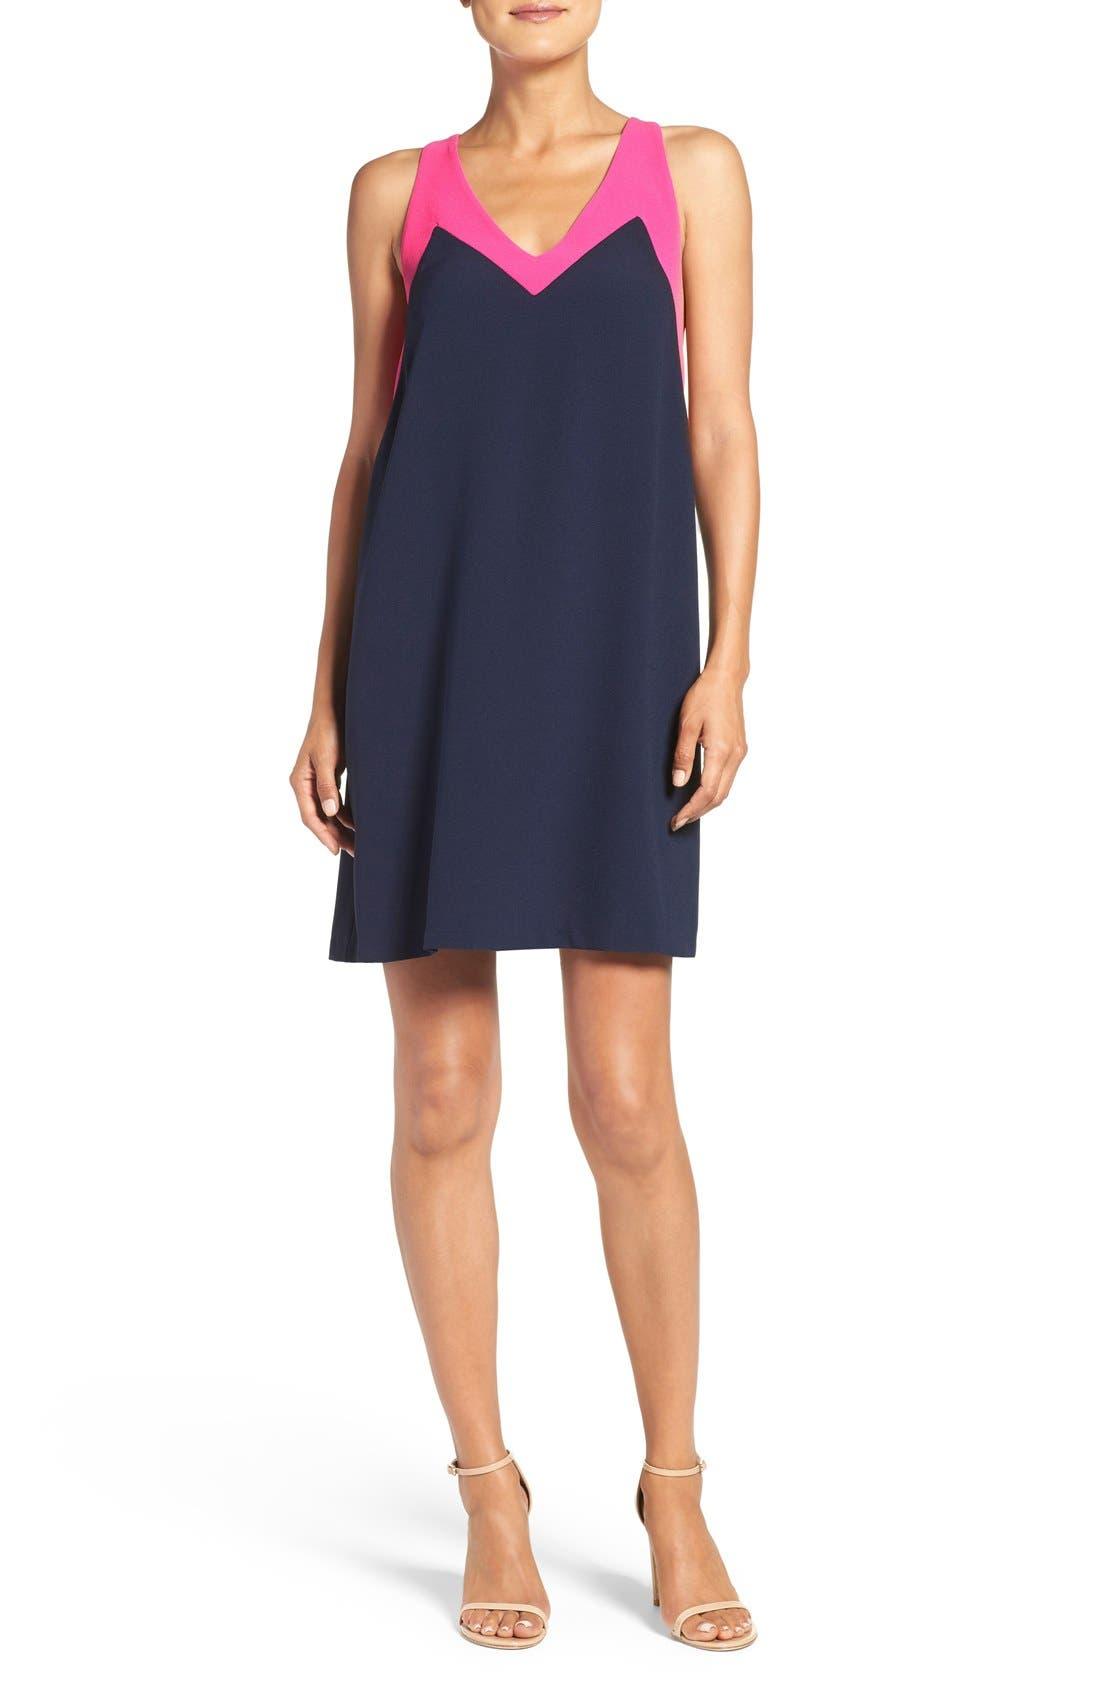 FELICITY & COCO Katy Colorblock Shift Dress